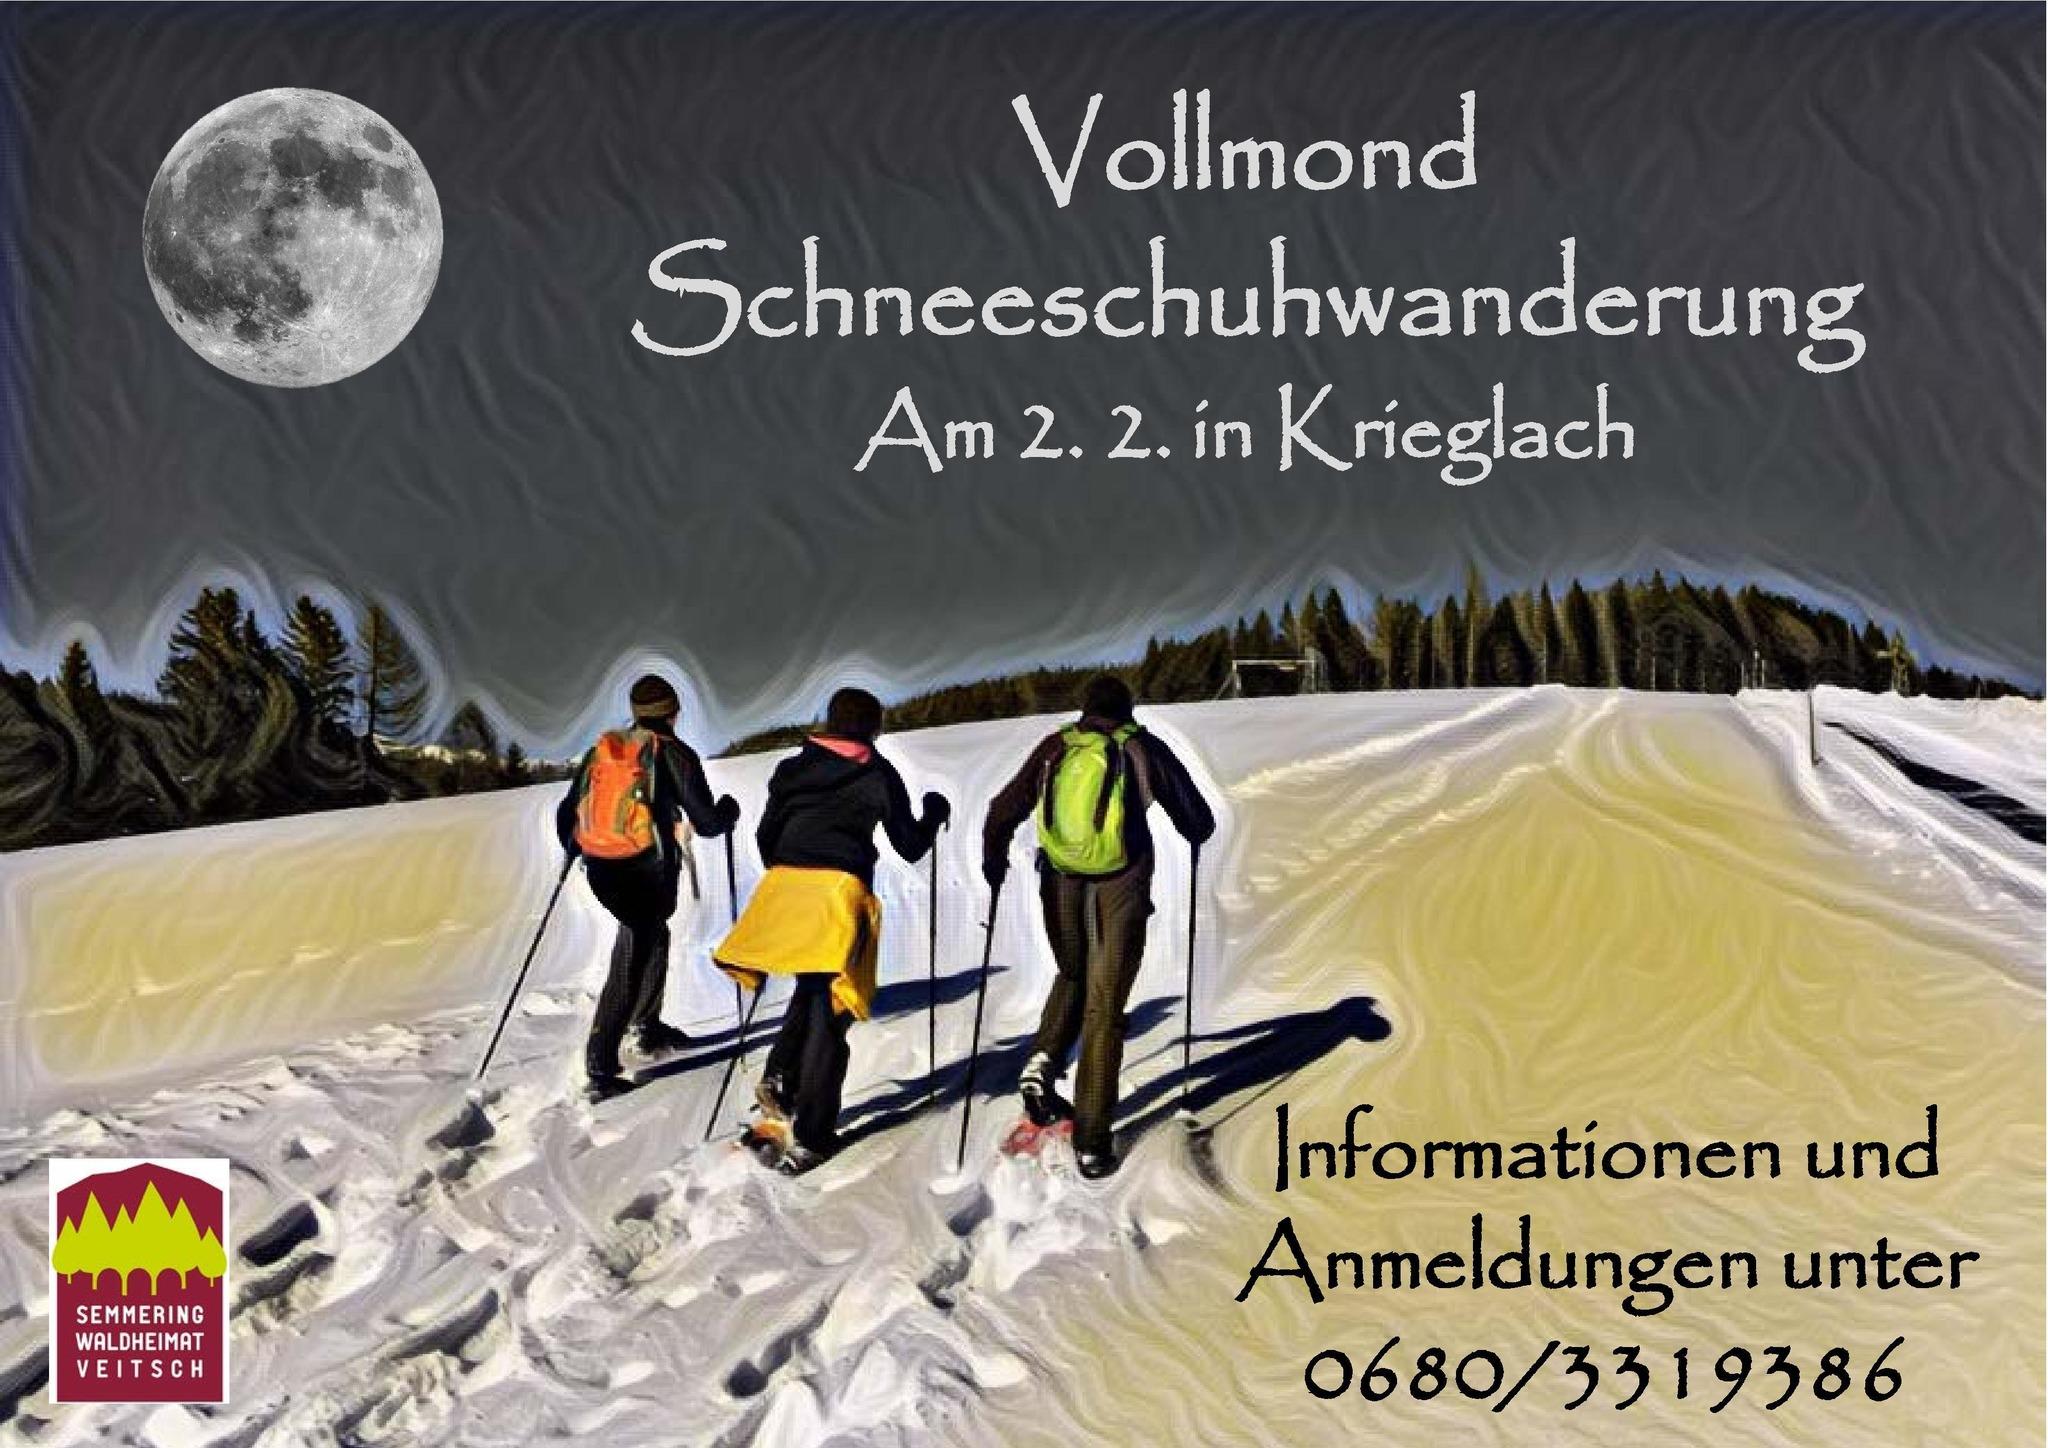 Krieglach - Thema auf blaklimos.com